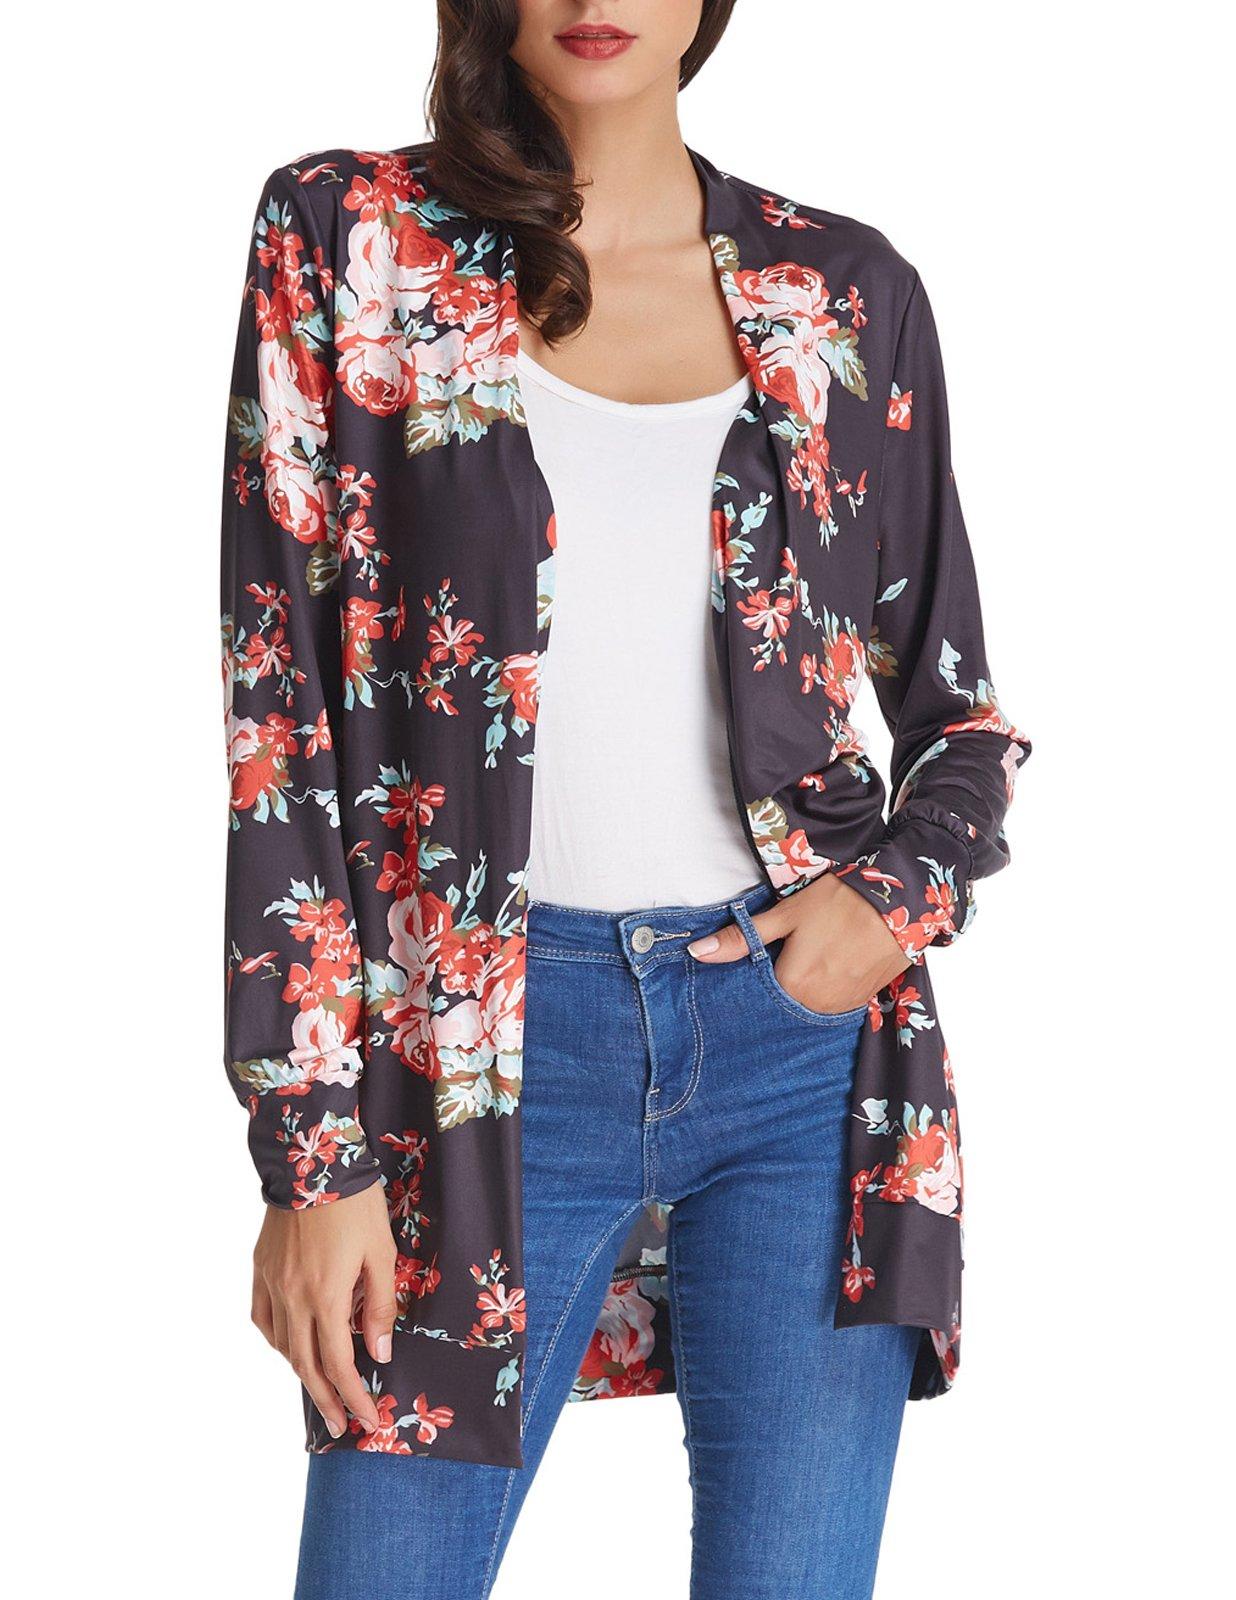 GRACE KARIN Women's Lightweight Casual Cardigan Wrap Floral Outwear Kimono Size XL Black